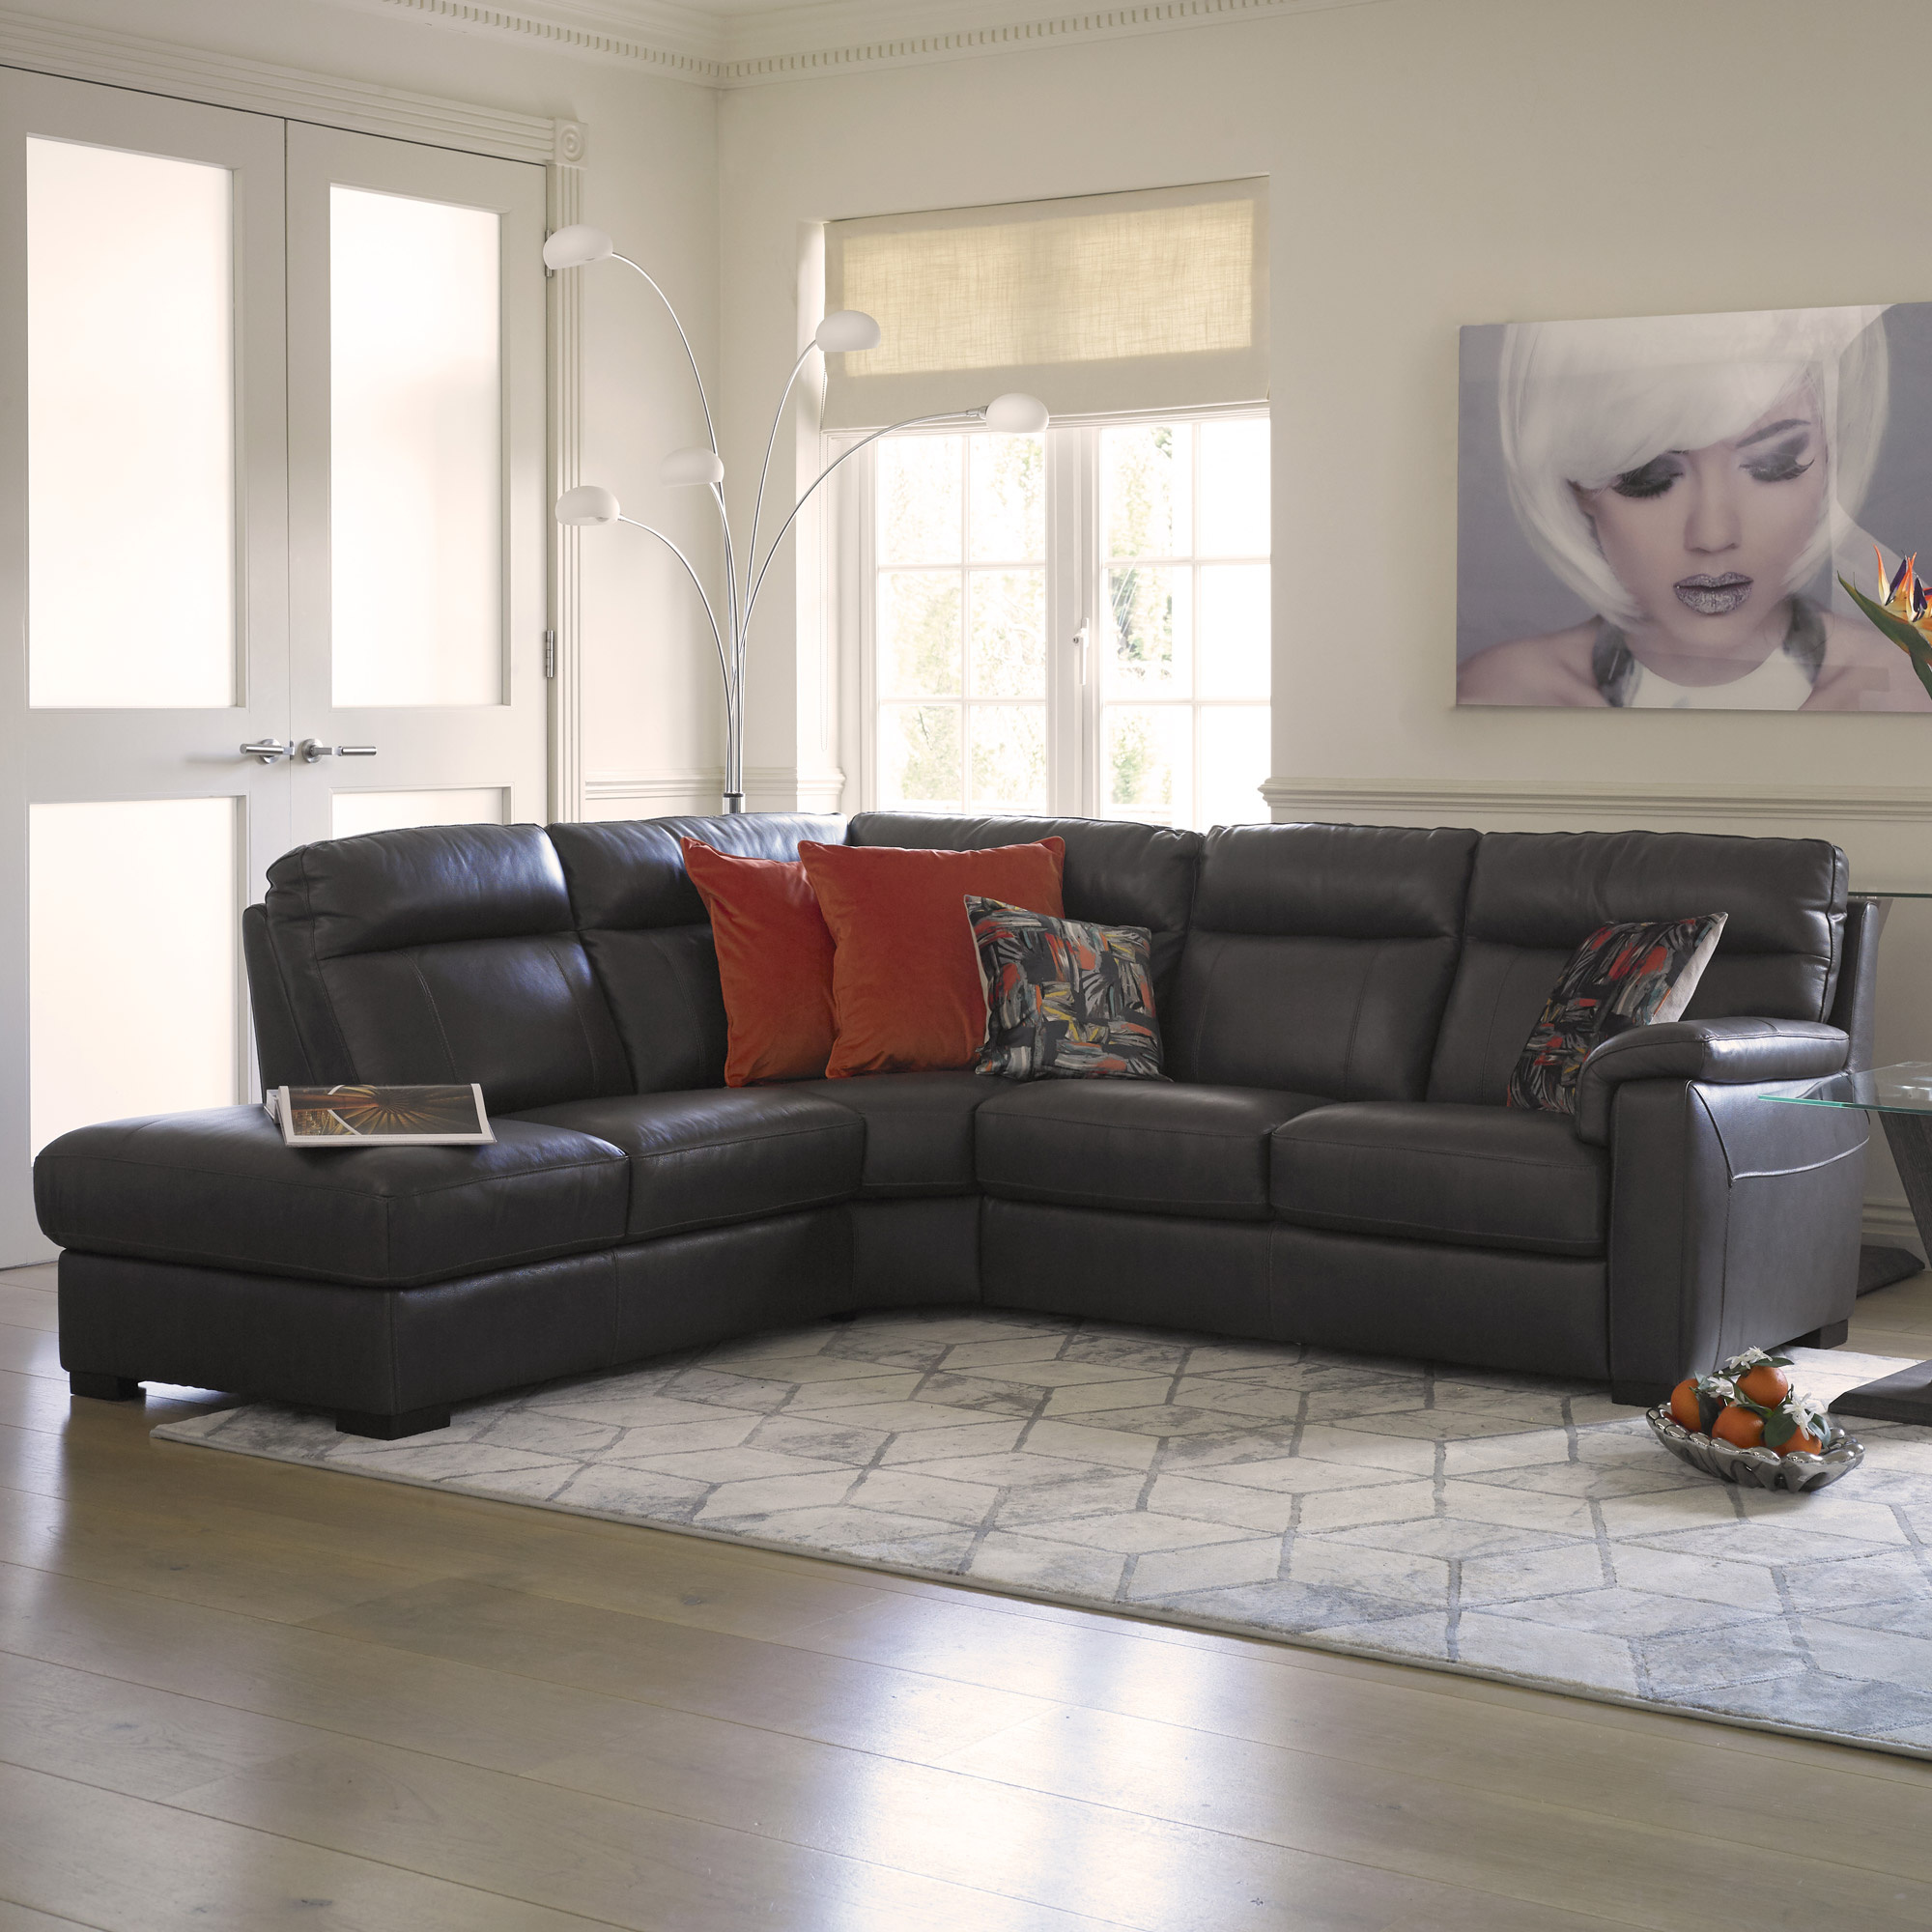 trentino grey leather corner sofa left